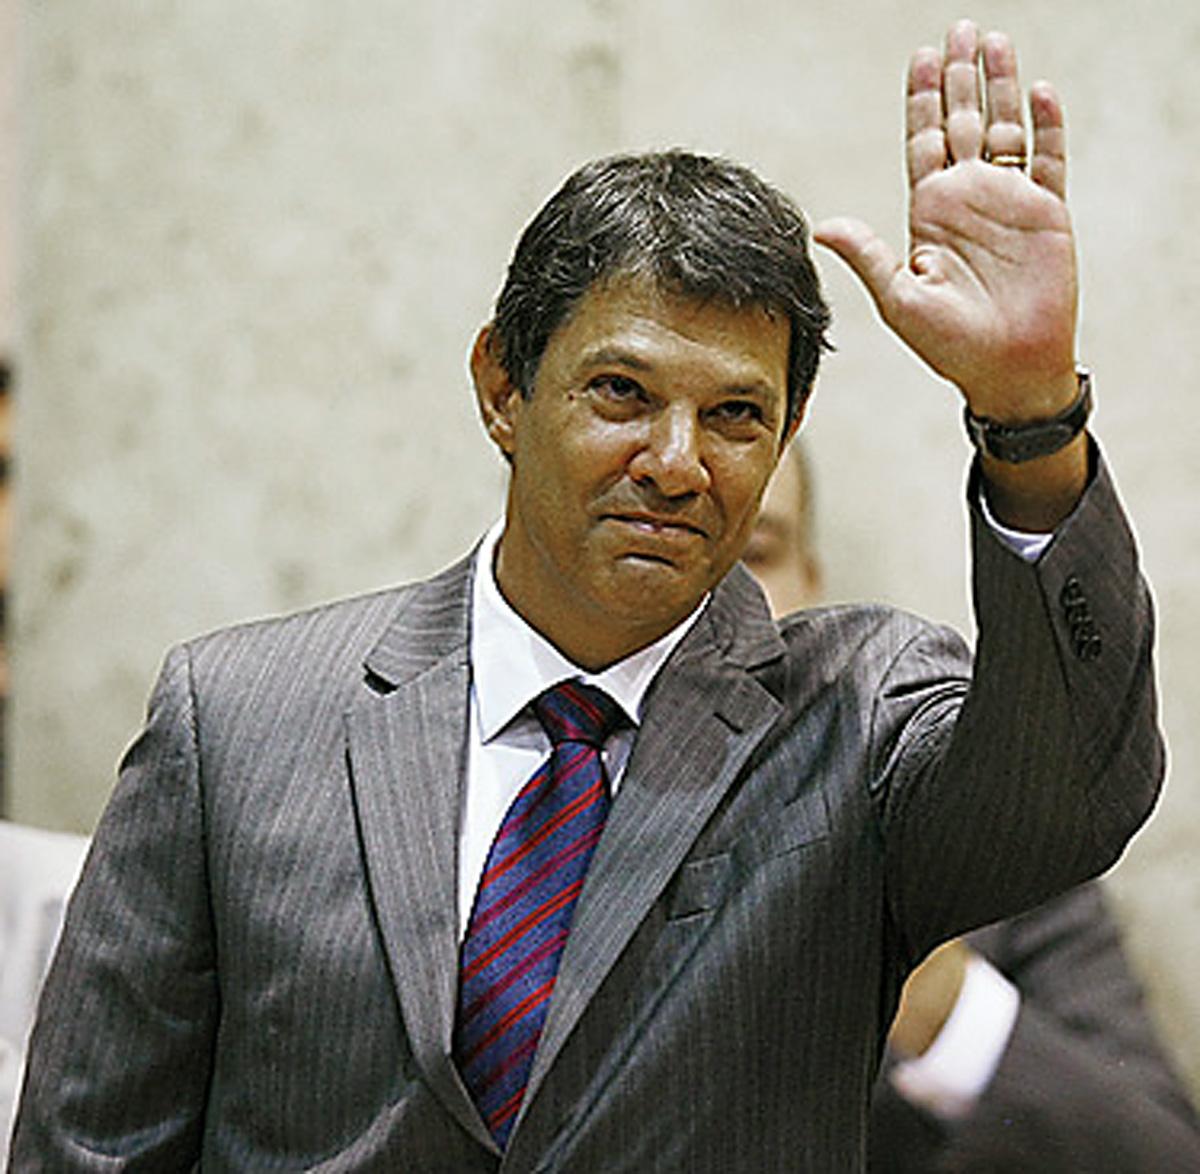 Fernando Haddad, atual prefeito de São Paulo<a style='float:right' href='https://www3.al.sp.gov.br/repositorio/noticia/N-01-2013/fg120564.jpg' target=_blank><img src='/_img/material-file-download-white.png' width='14px' alt='Clique para baixar a imagem'></a>